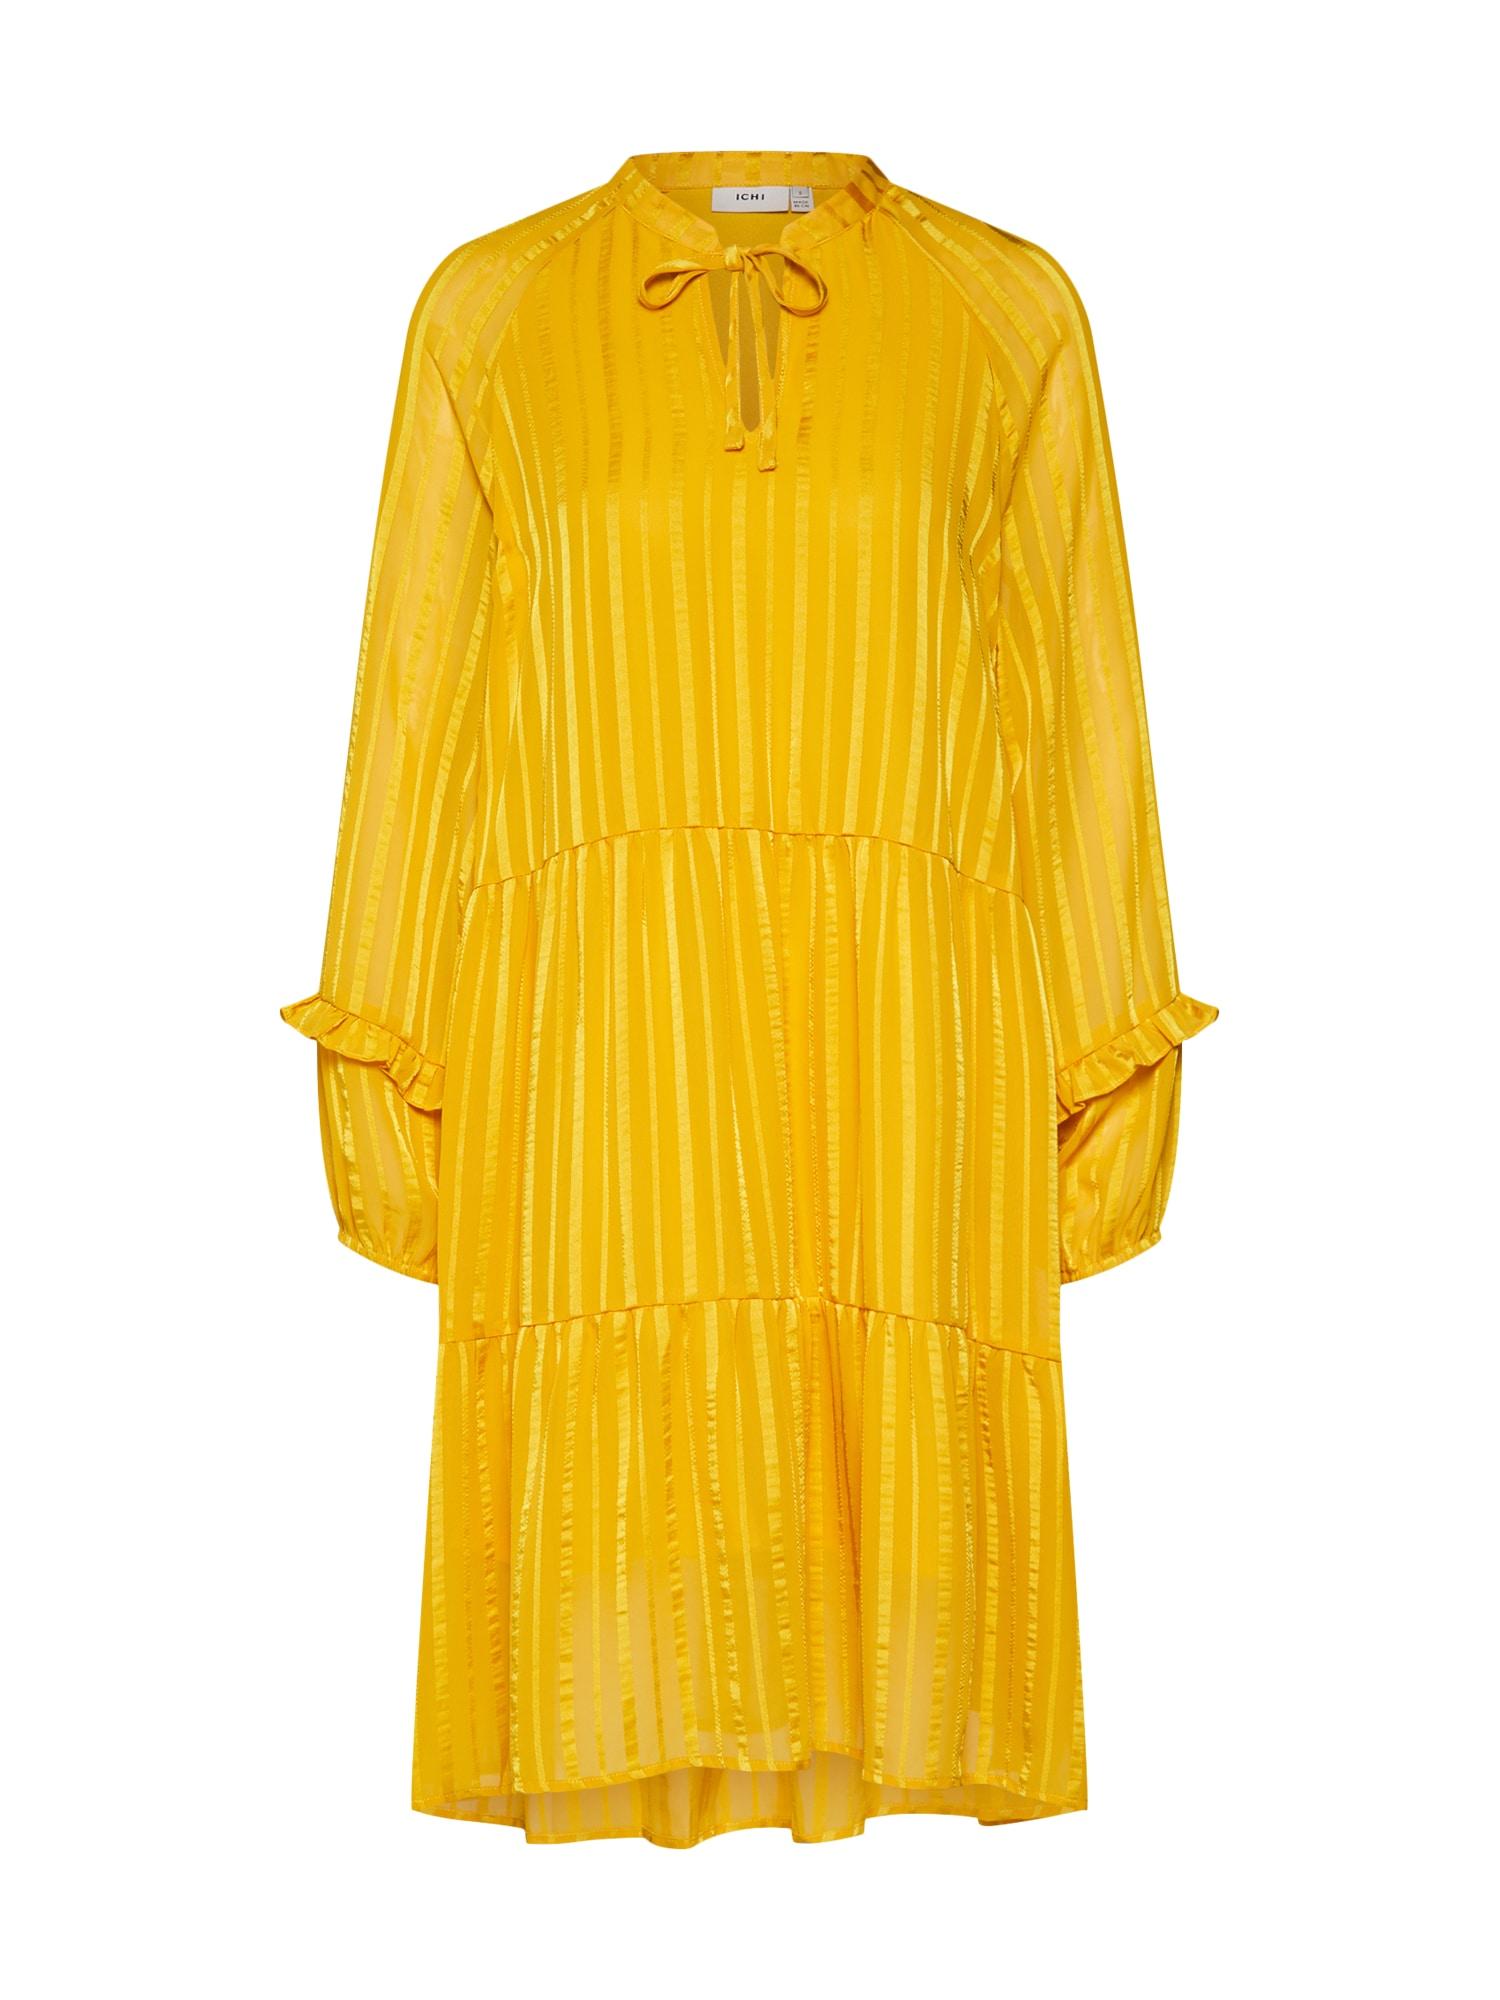 Letní šaty IXDONNA DR žlutá ICHI